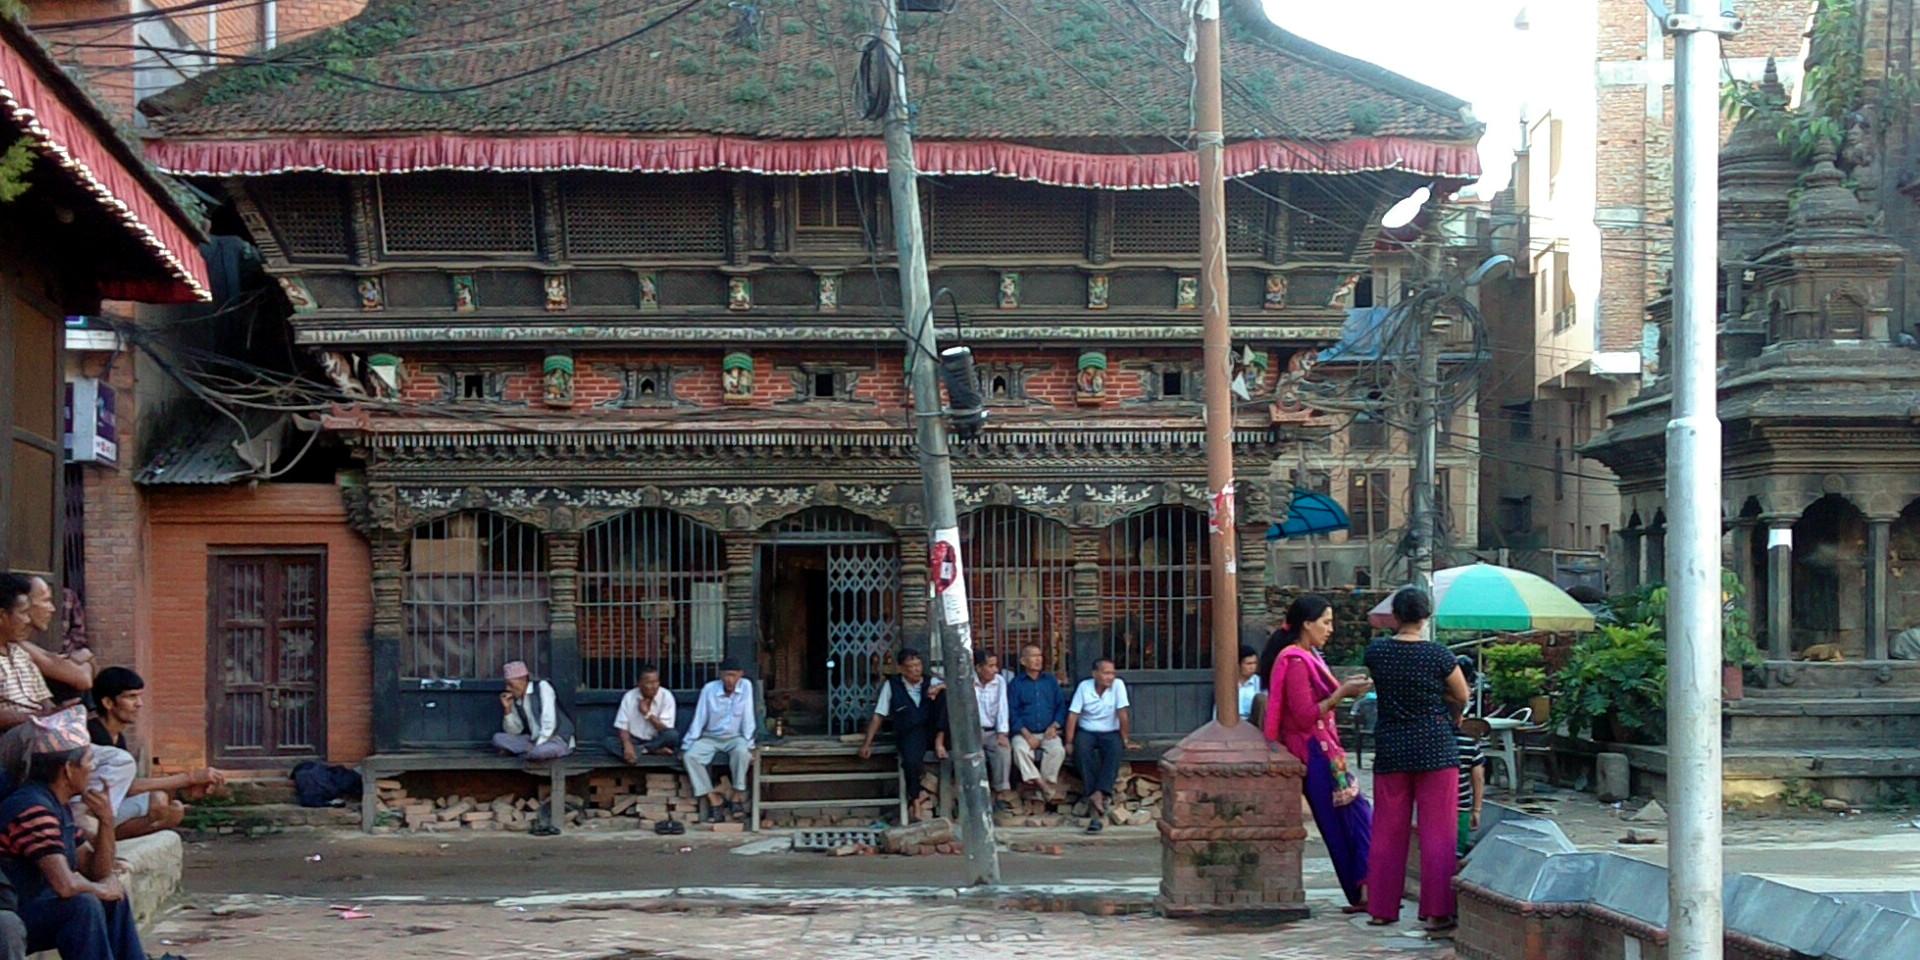 Patan street scene.